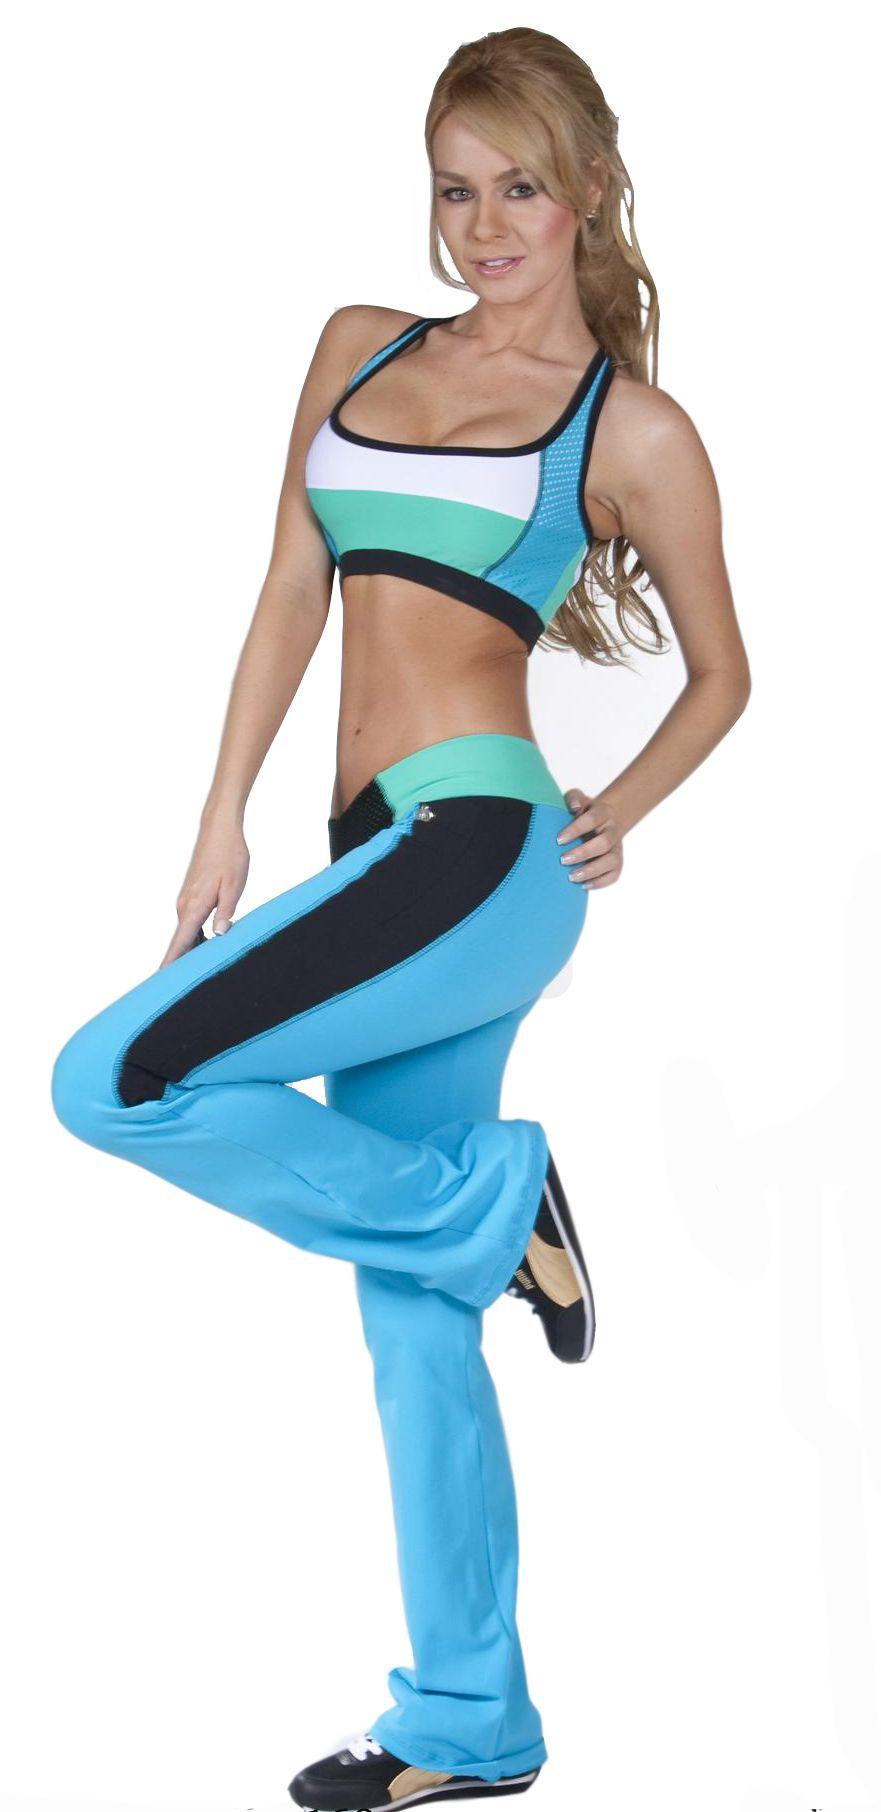 b9113fc87fb4 Tiempo Libre Set  Bra Top  amp  Pants Sexy Workout Clothes